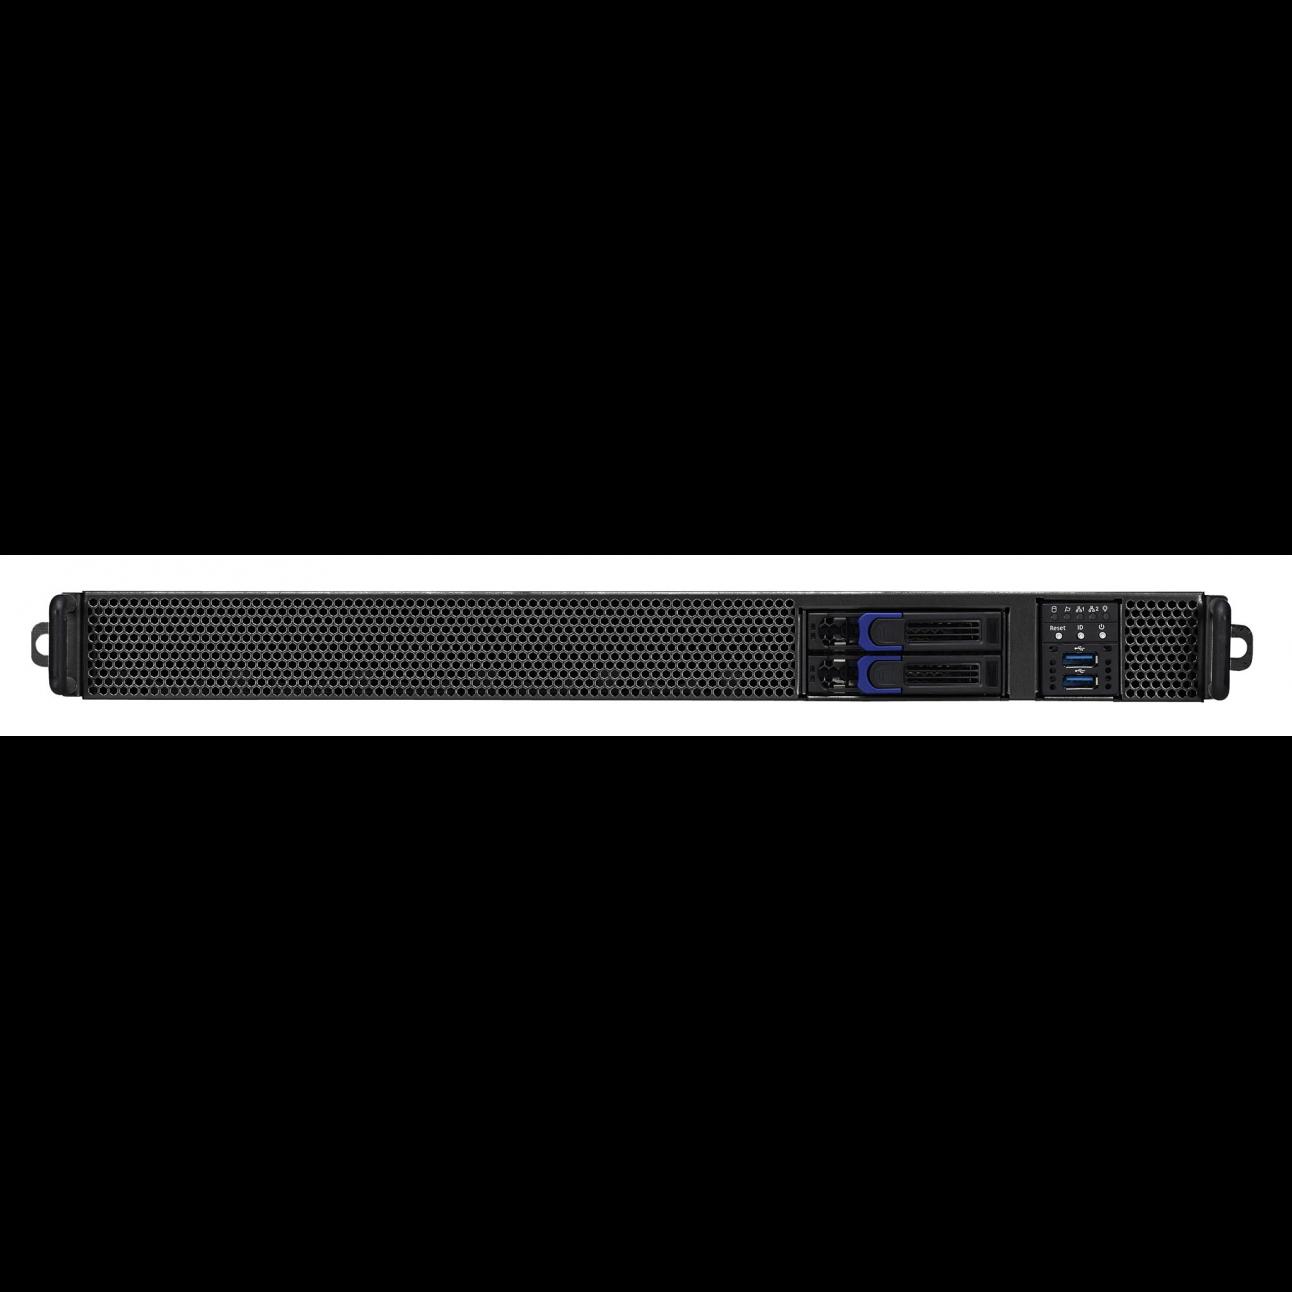 Серверная платформа Tyan Thunder HX B5631G88V2HR, 1U, Scalable, DDR4, 2xHDD, резервируемый БП